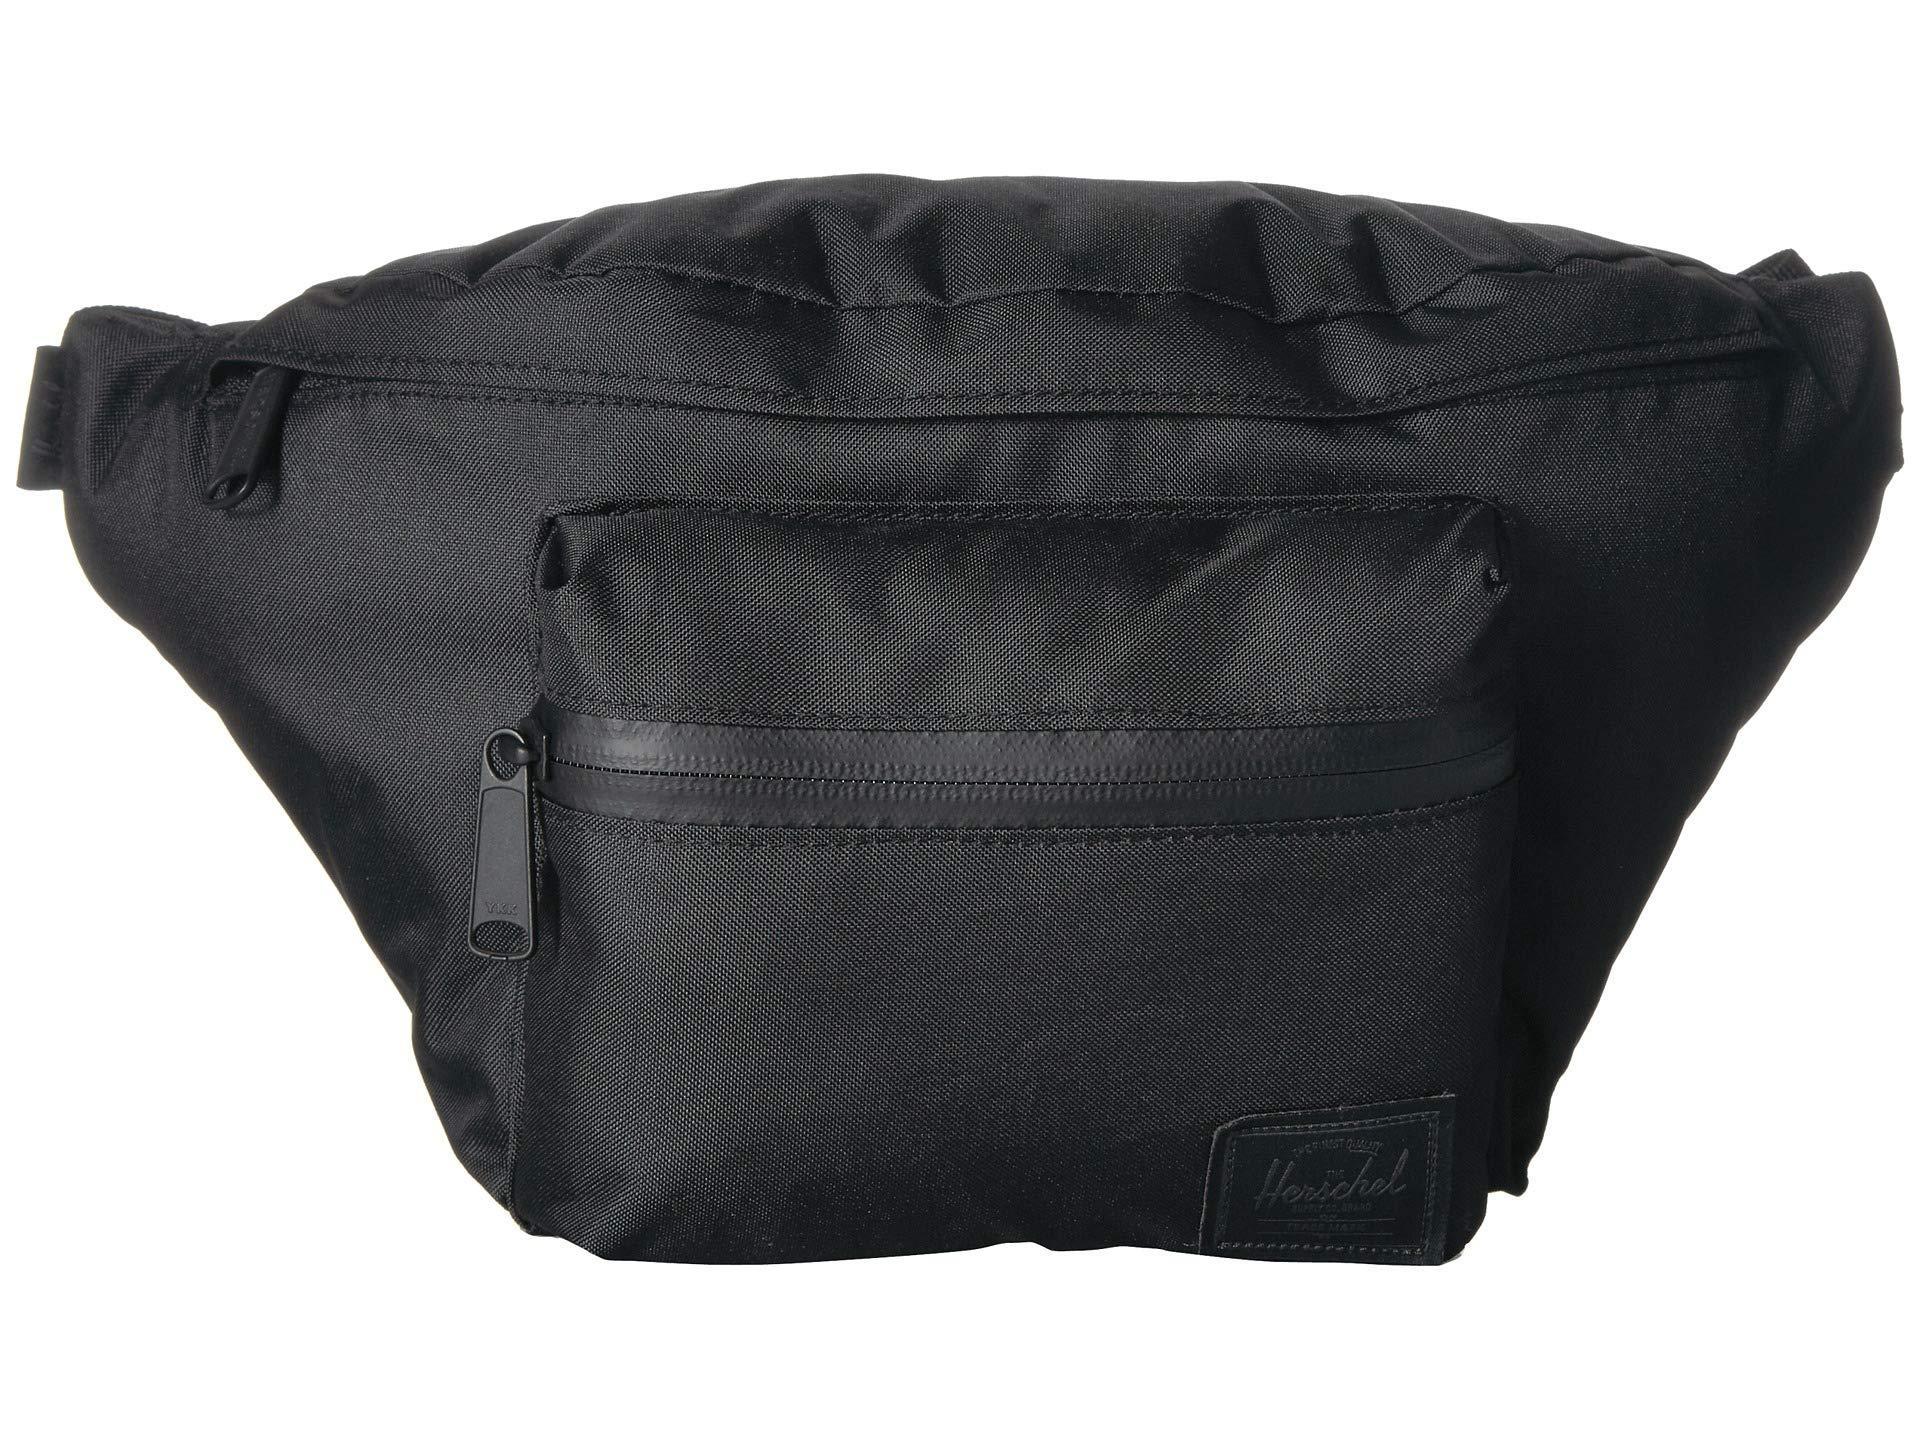 653bdeb5bb5 Lyst - Herschel Supply Co. Seventeen Light (saddle Brown) Bags in Black